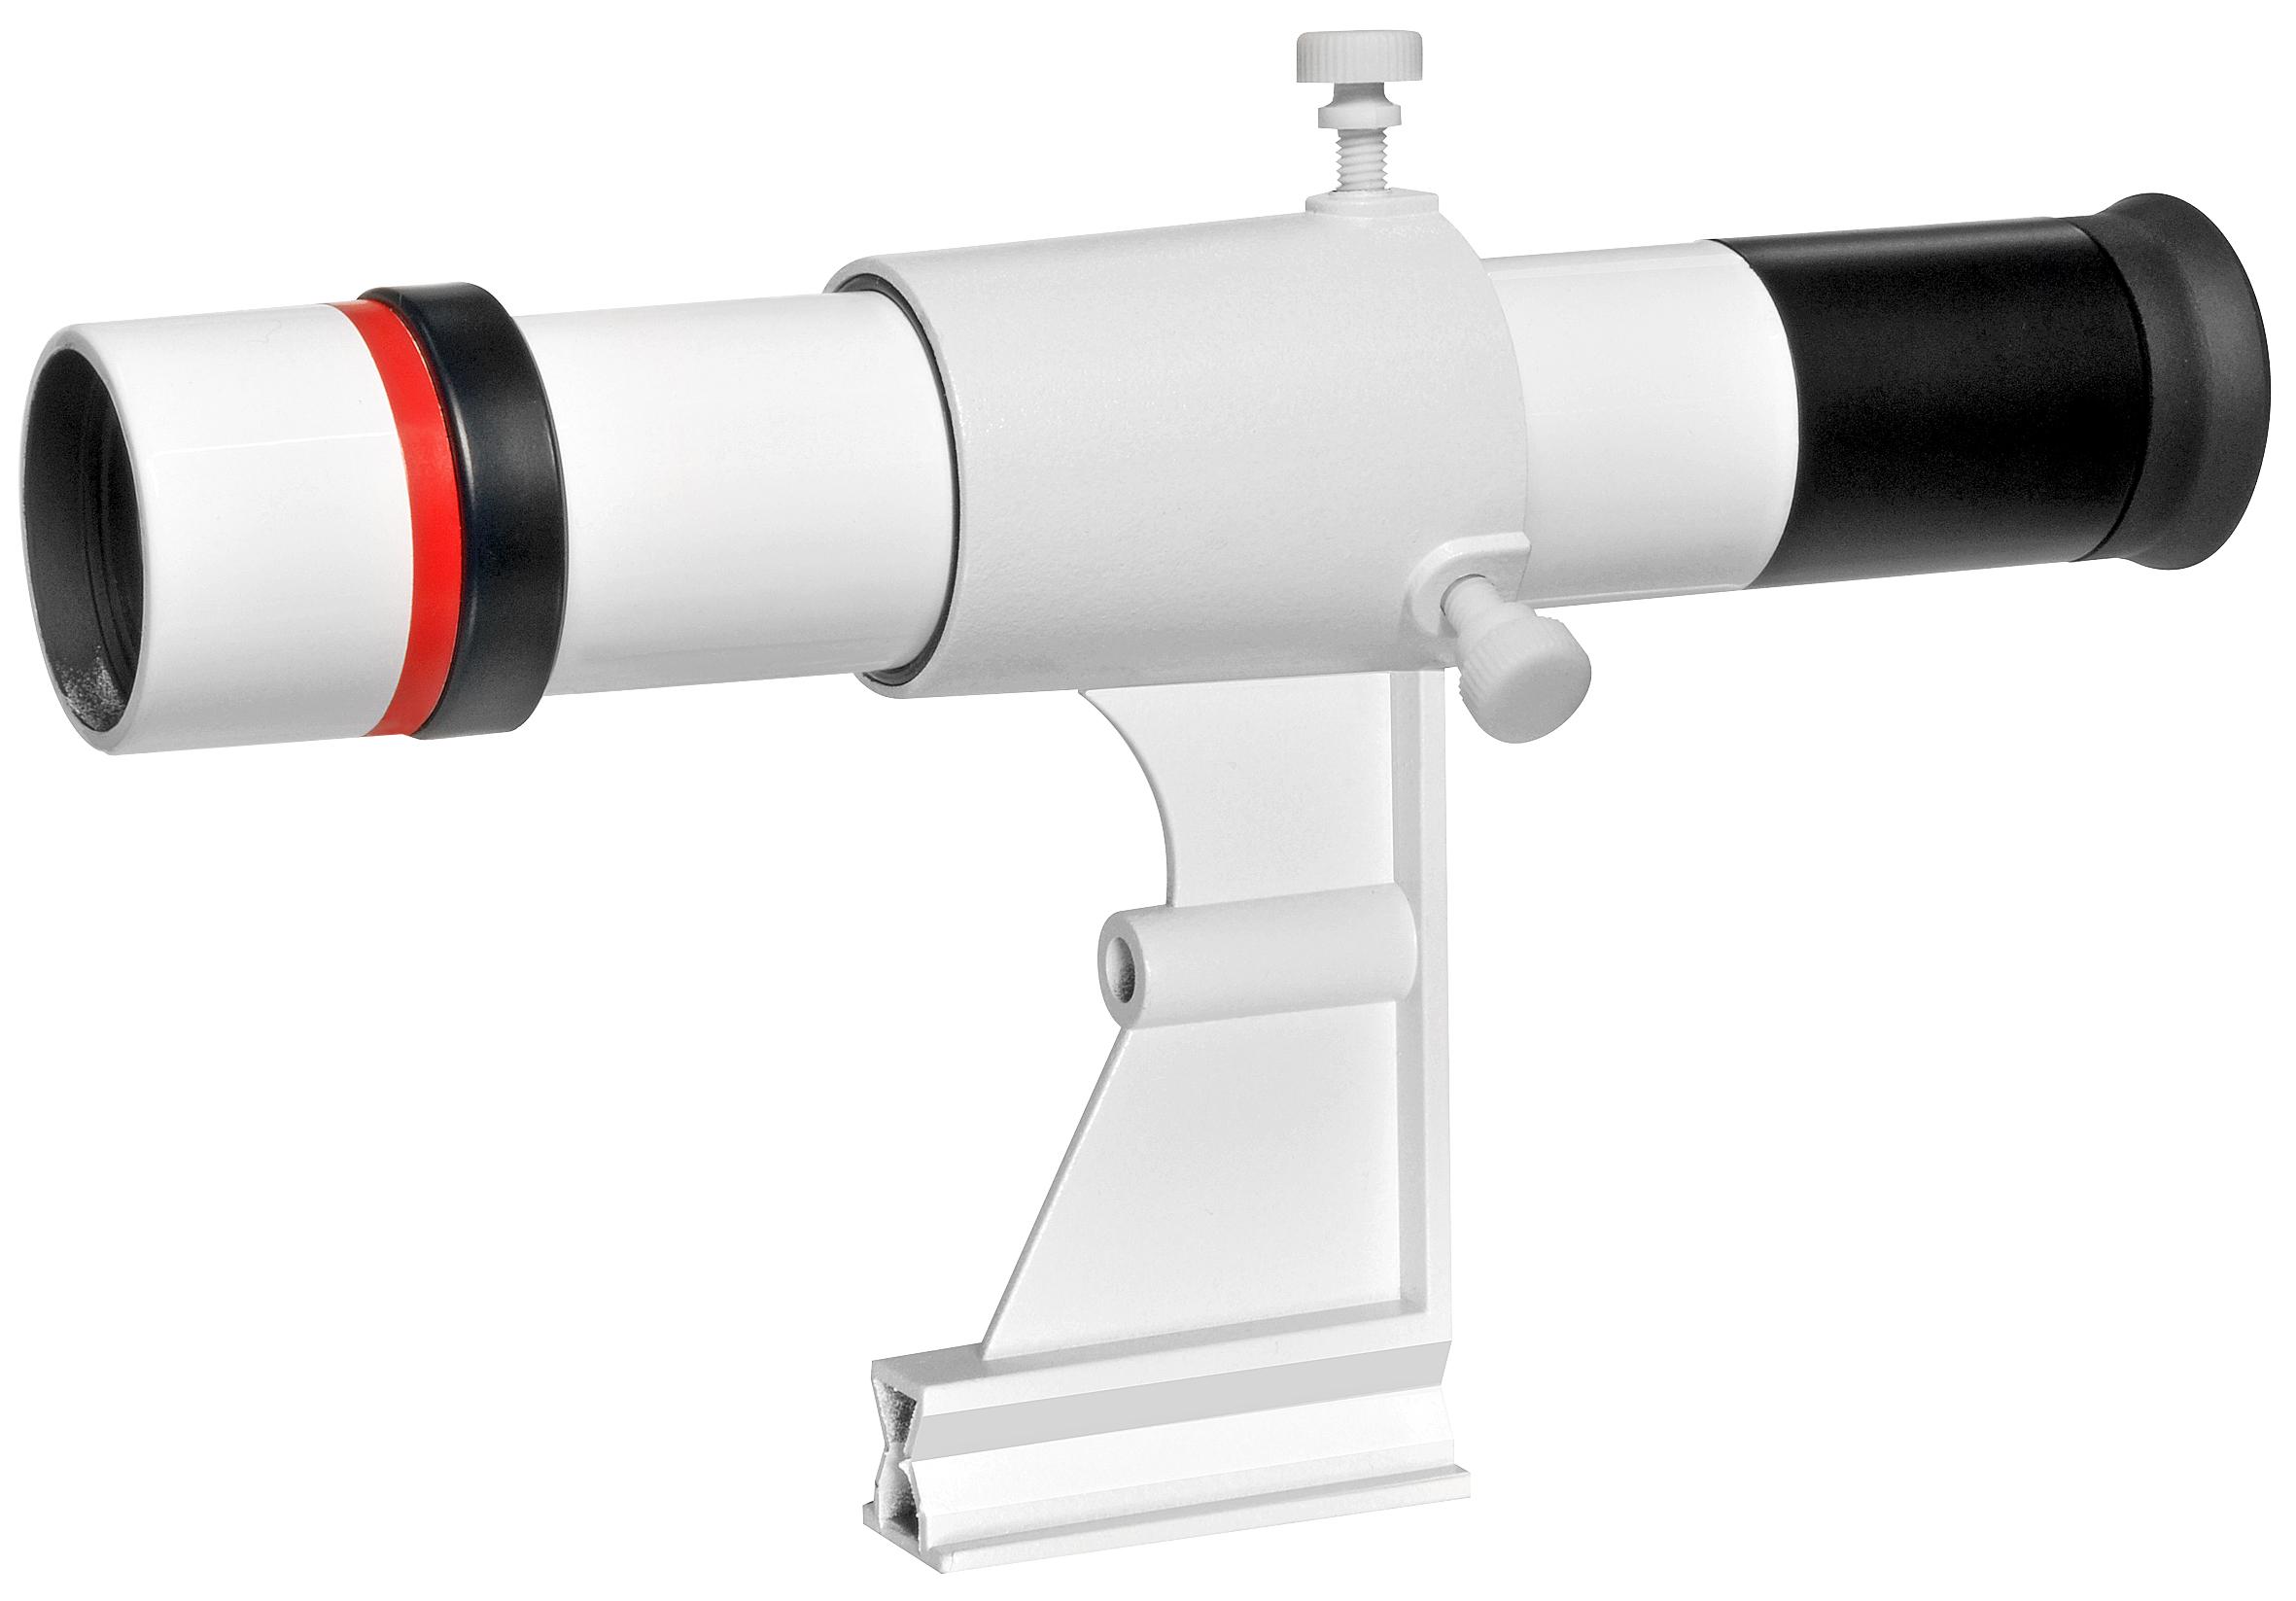 Bresser messier nt 150s 150 750 hexafoc exos 1 teleskop bresser